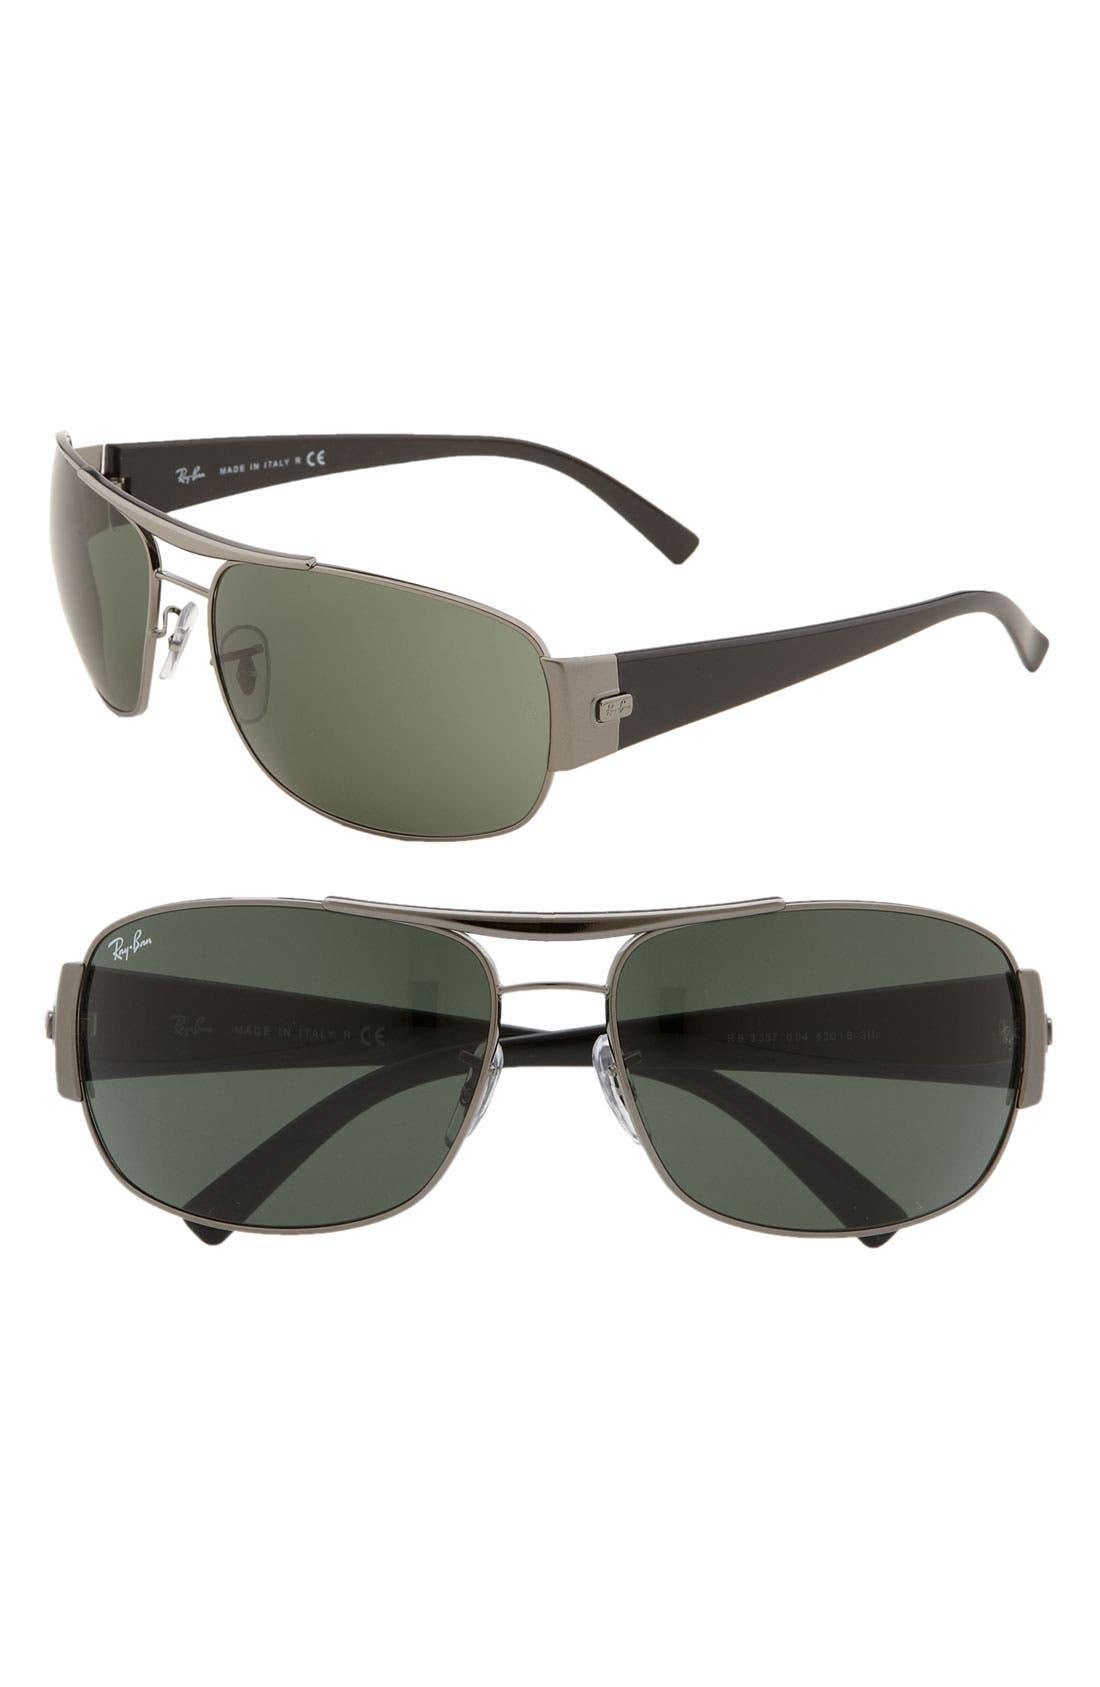 Main Image - Ray-Ban Square Wrap 63mm Aviator Sunglasses